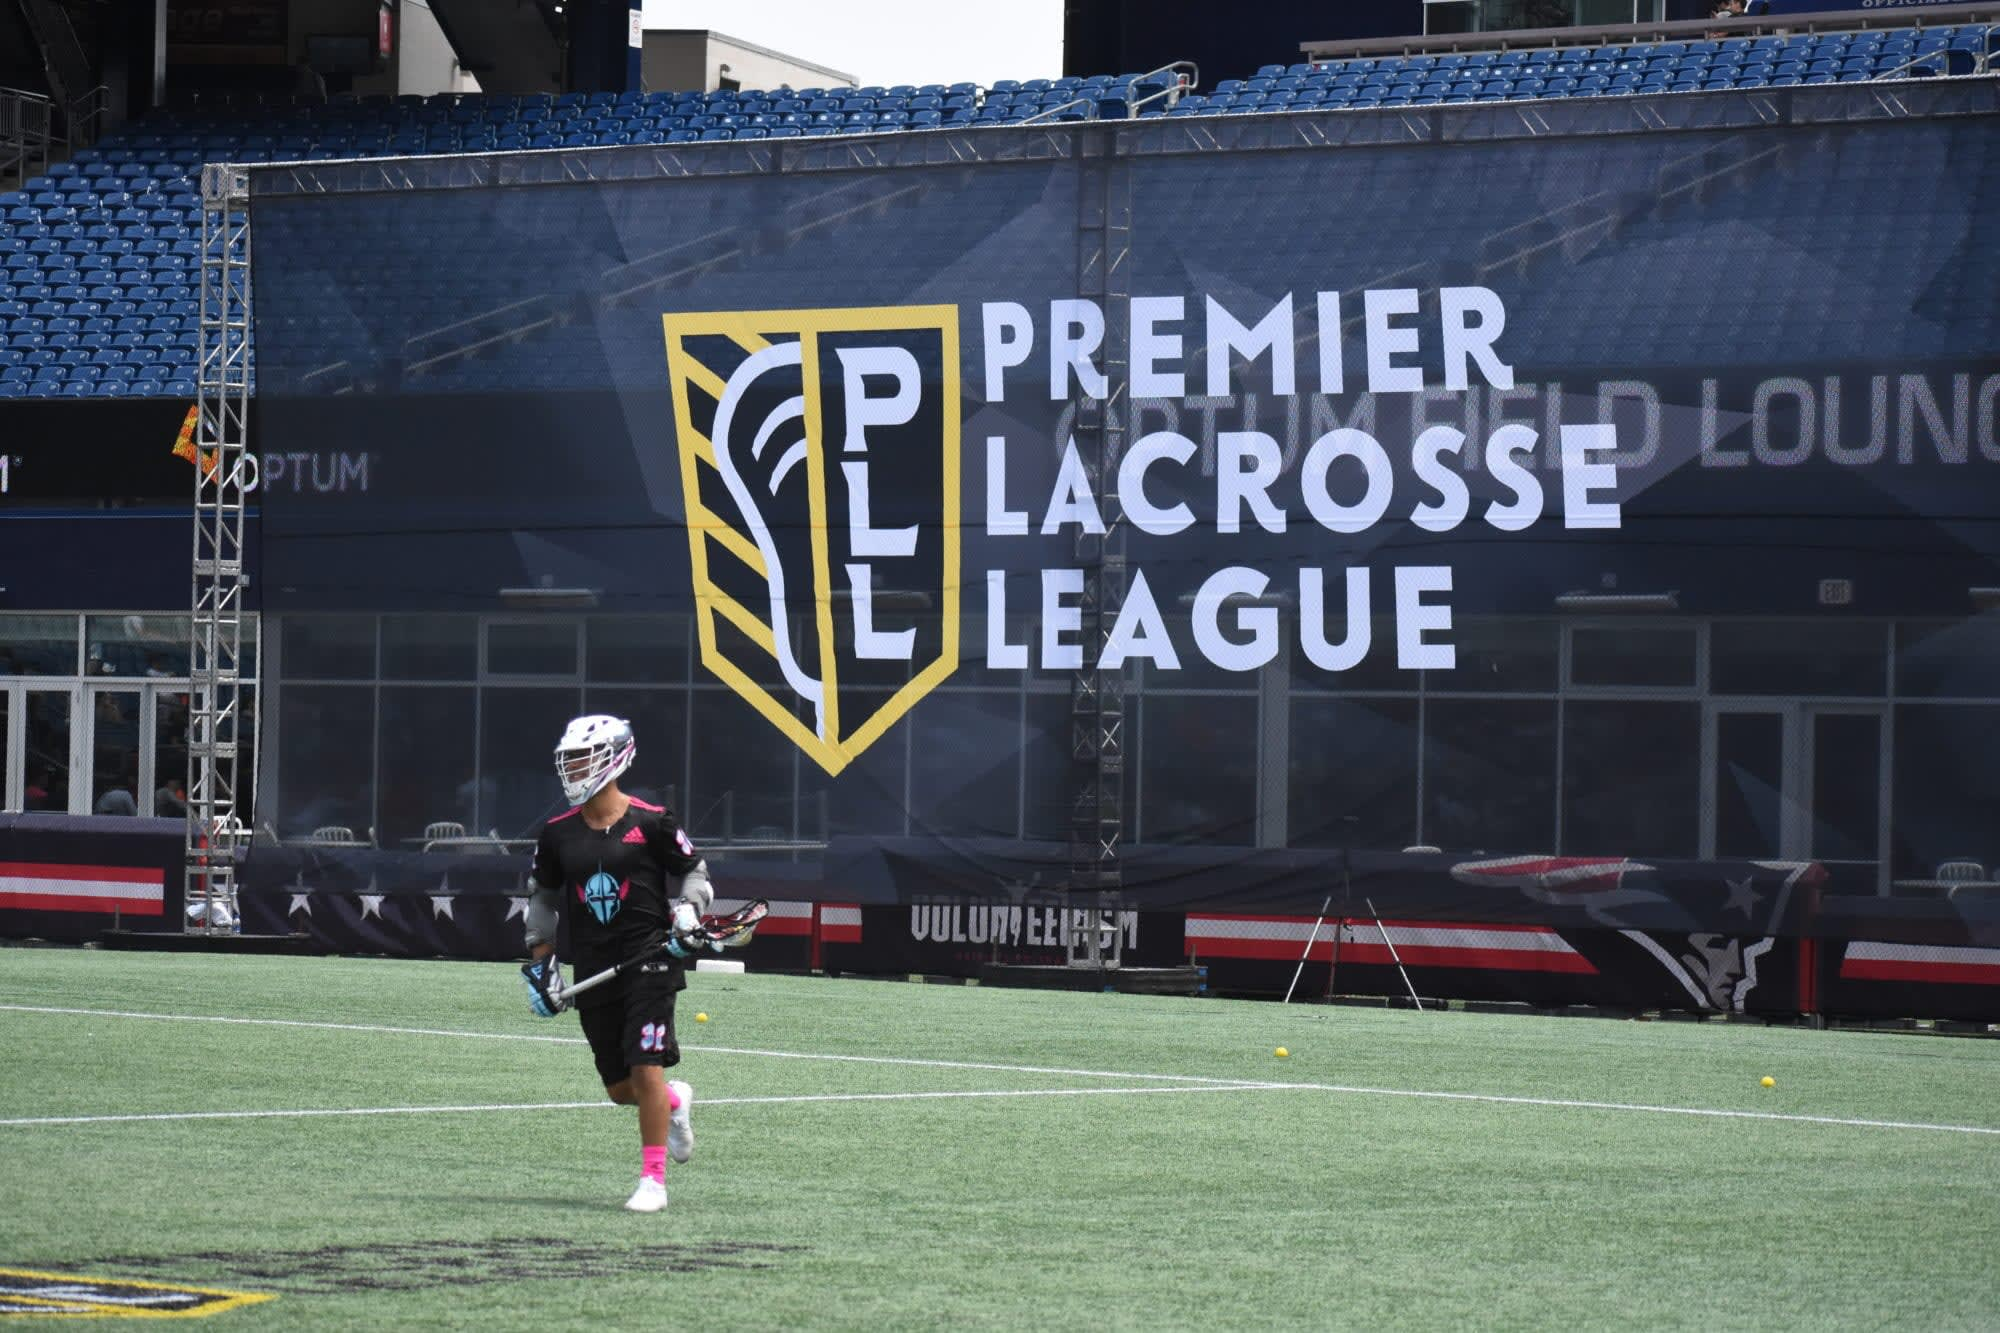 pll men's pro lacrosse 2019 season PLL All Star roster